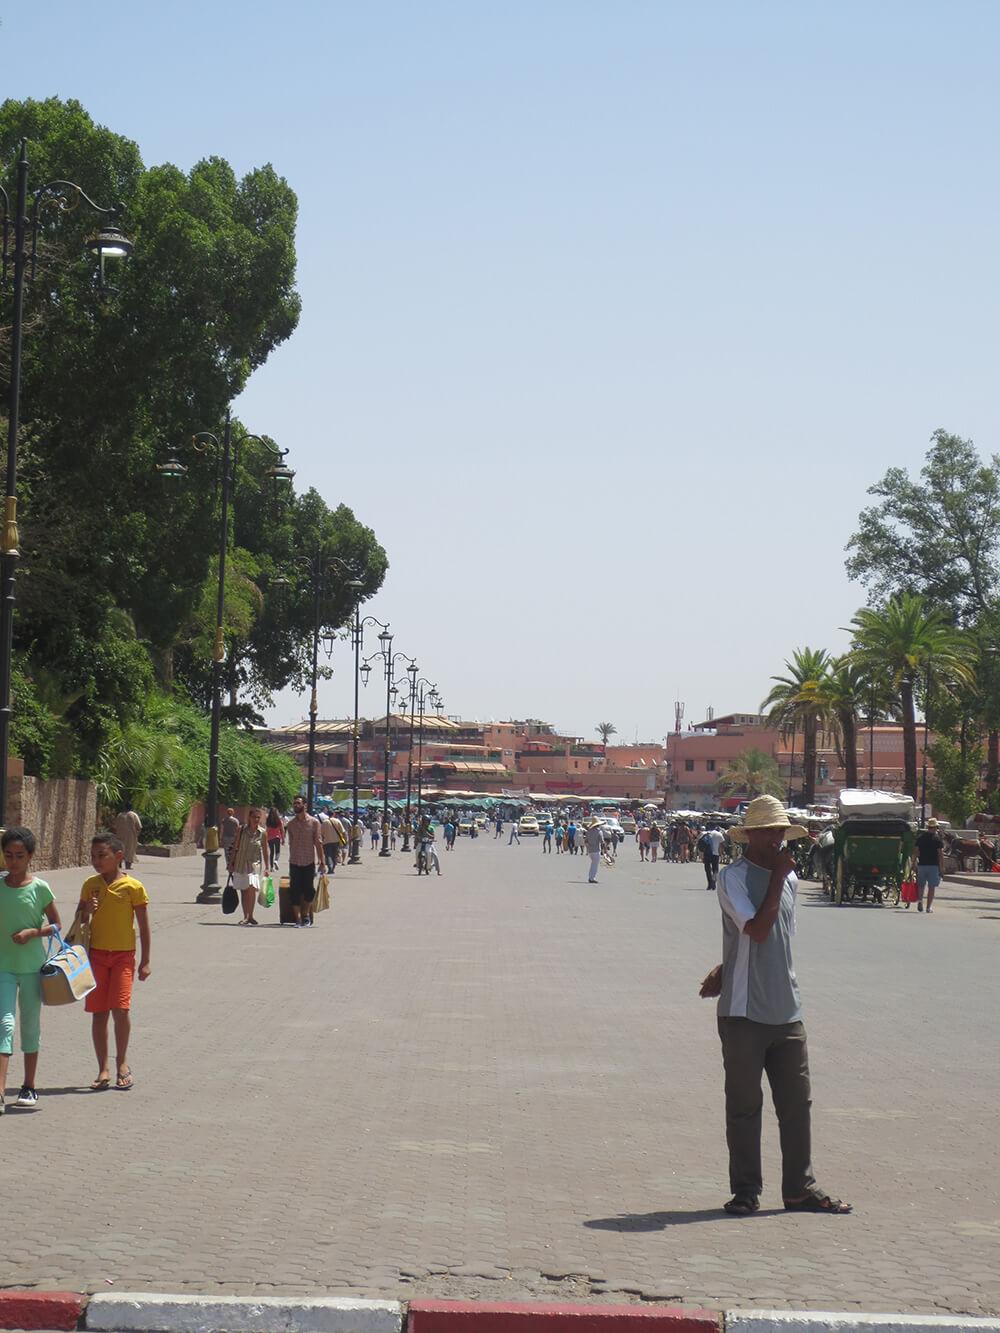 http://www.marrakechdream.ma/wp-content/uploads/2017/07/IMG_1020.jpg